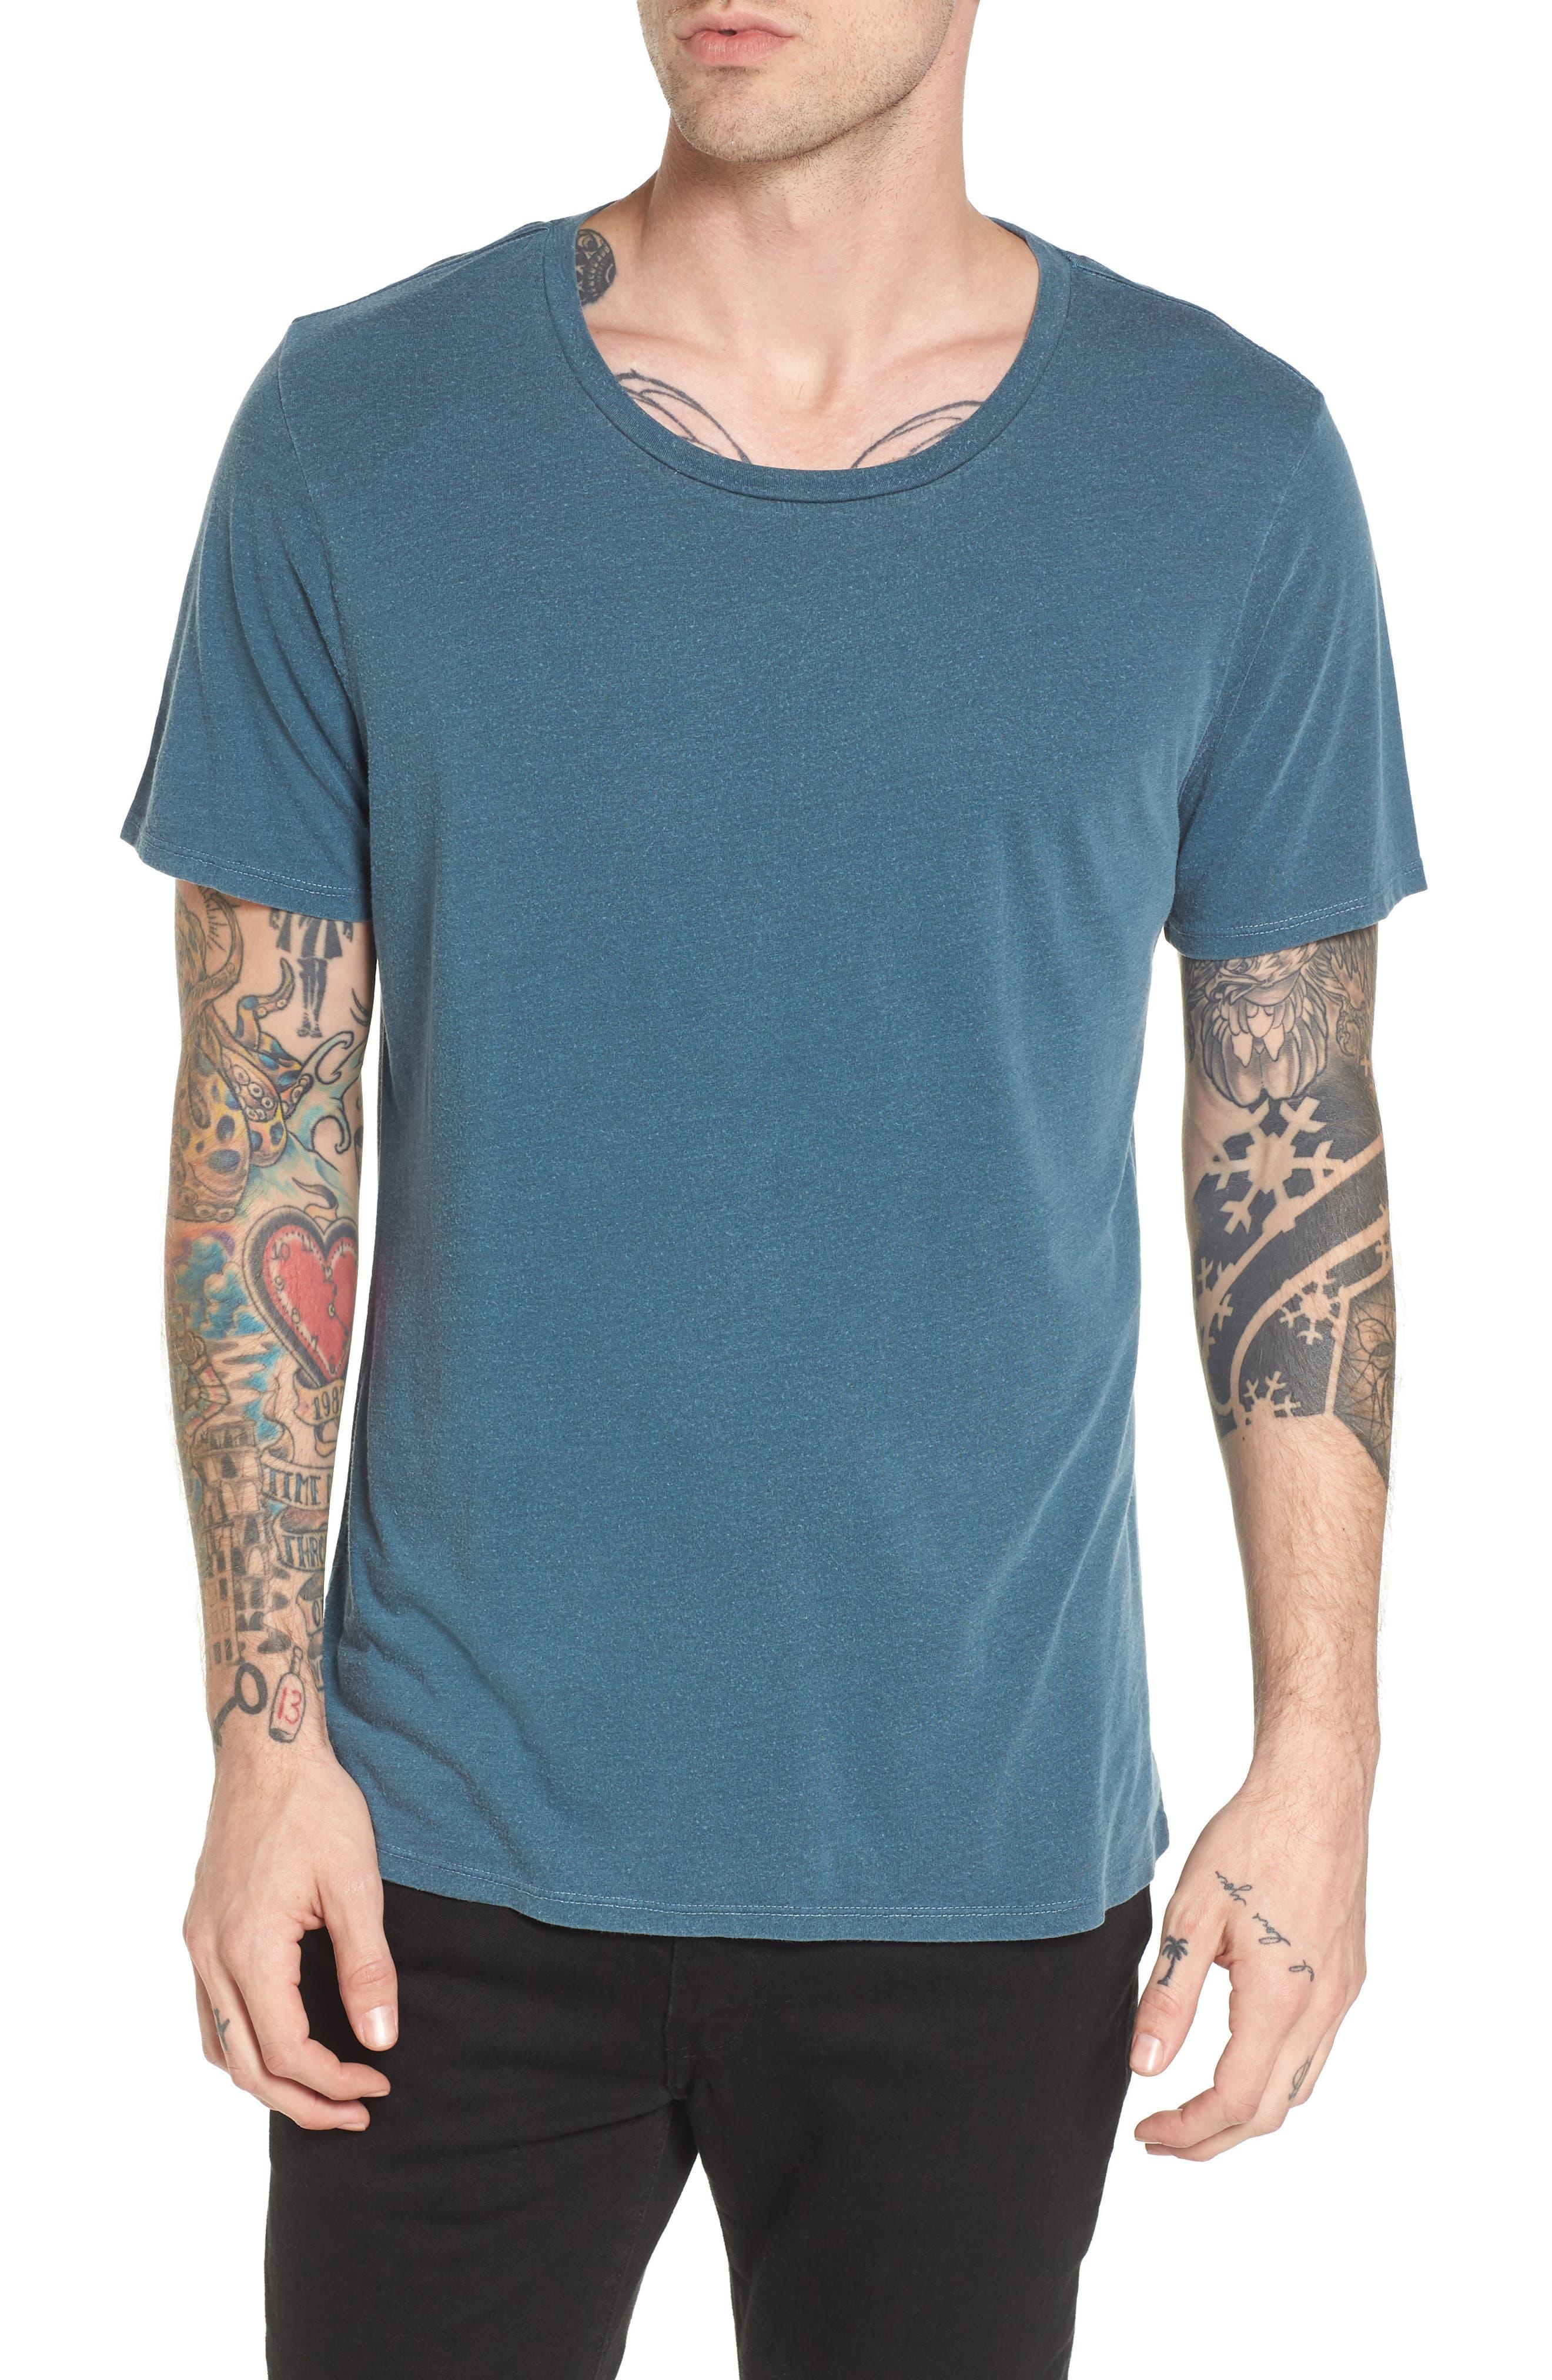 Alternate Image 1 Selected - The Rail Slim Fit Scoop Neck T-Shirt